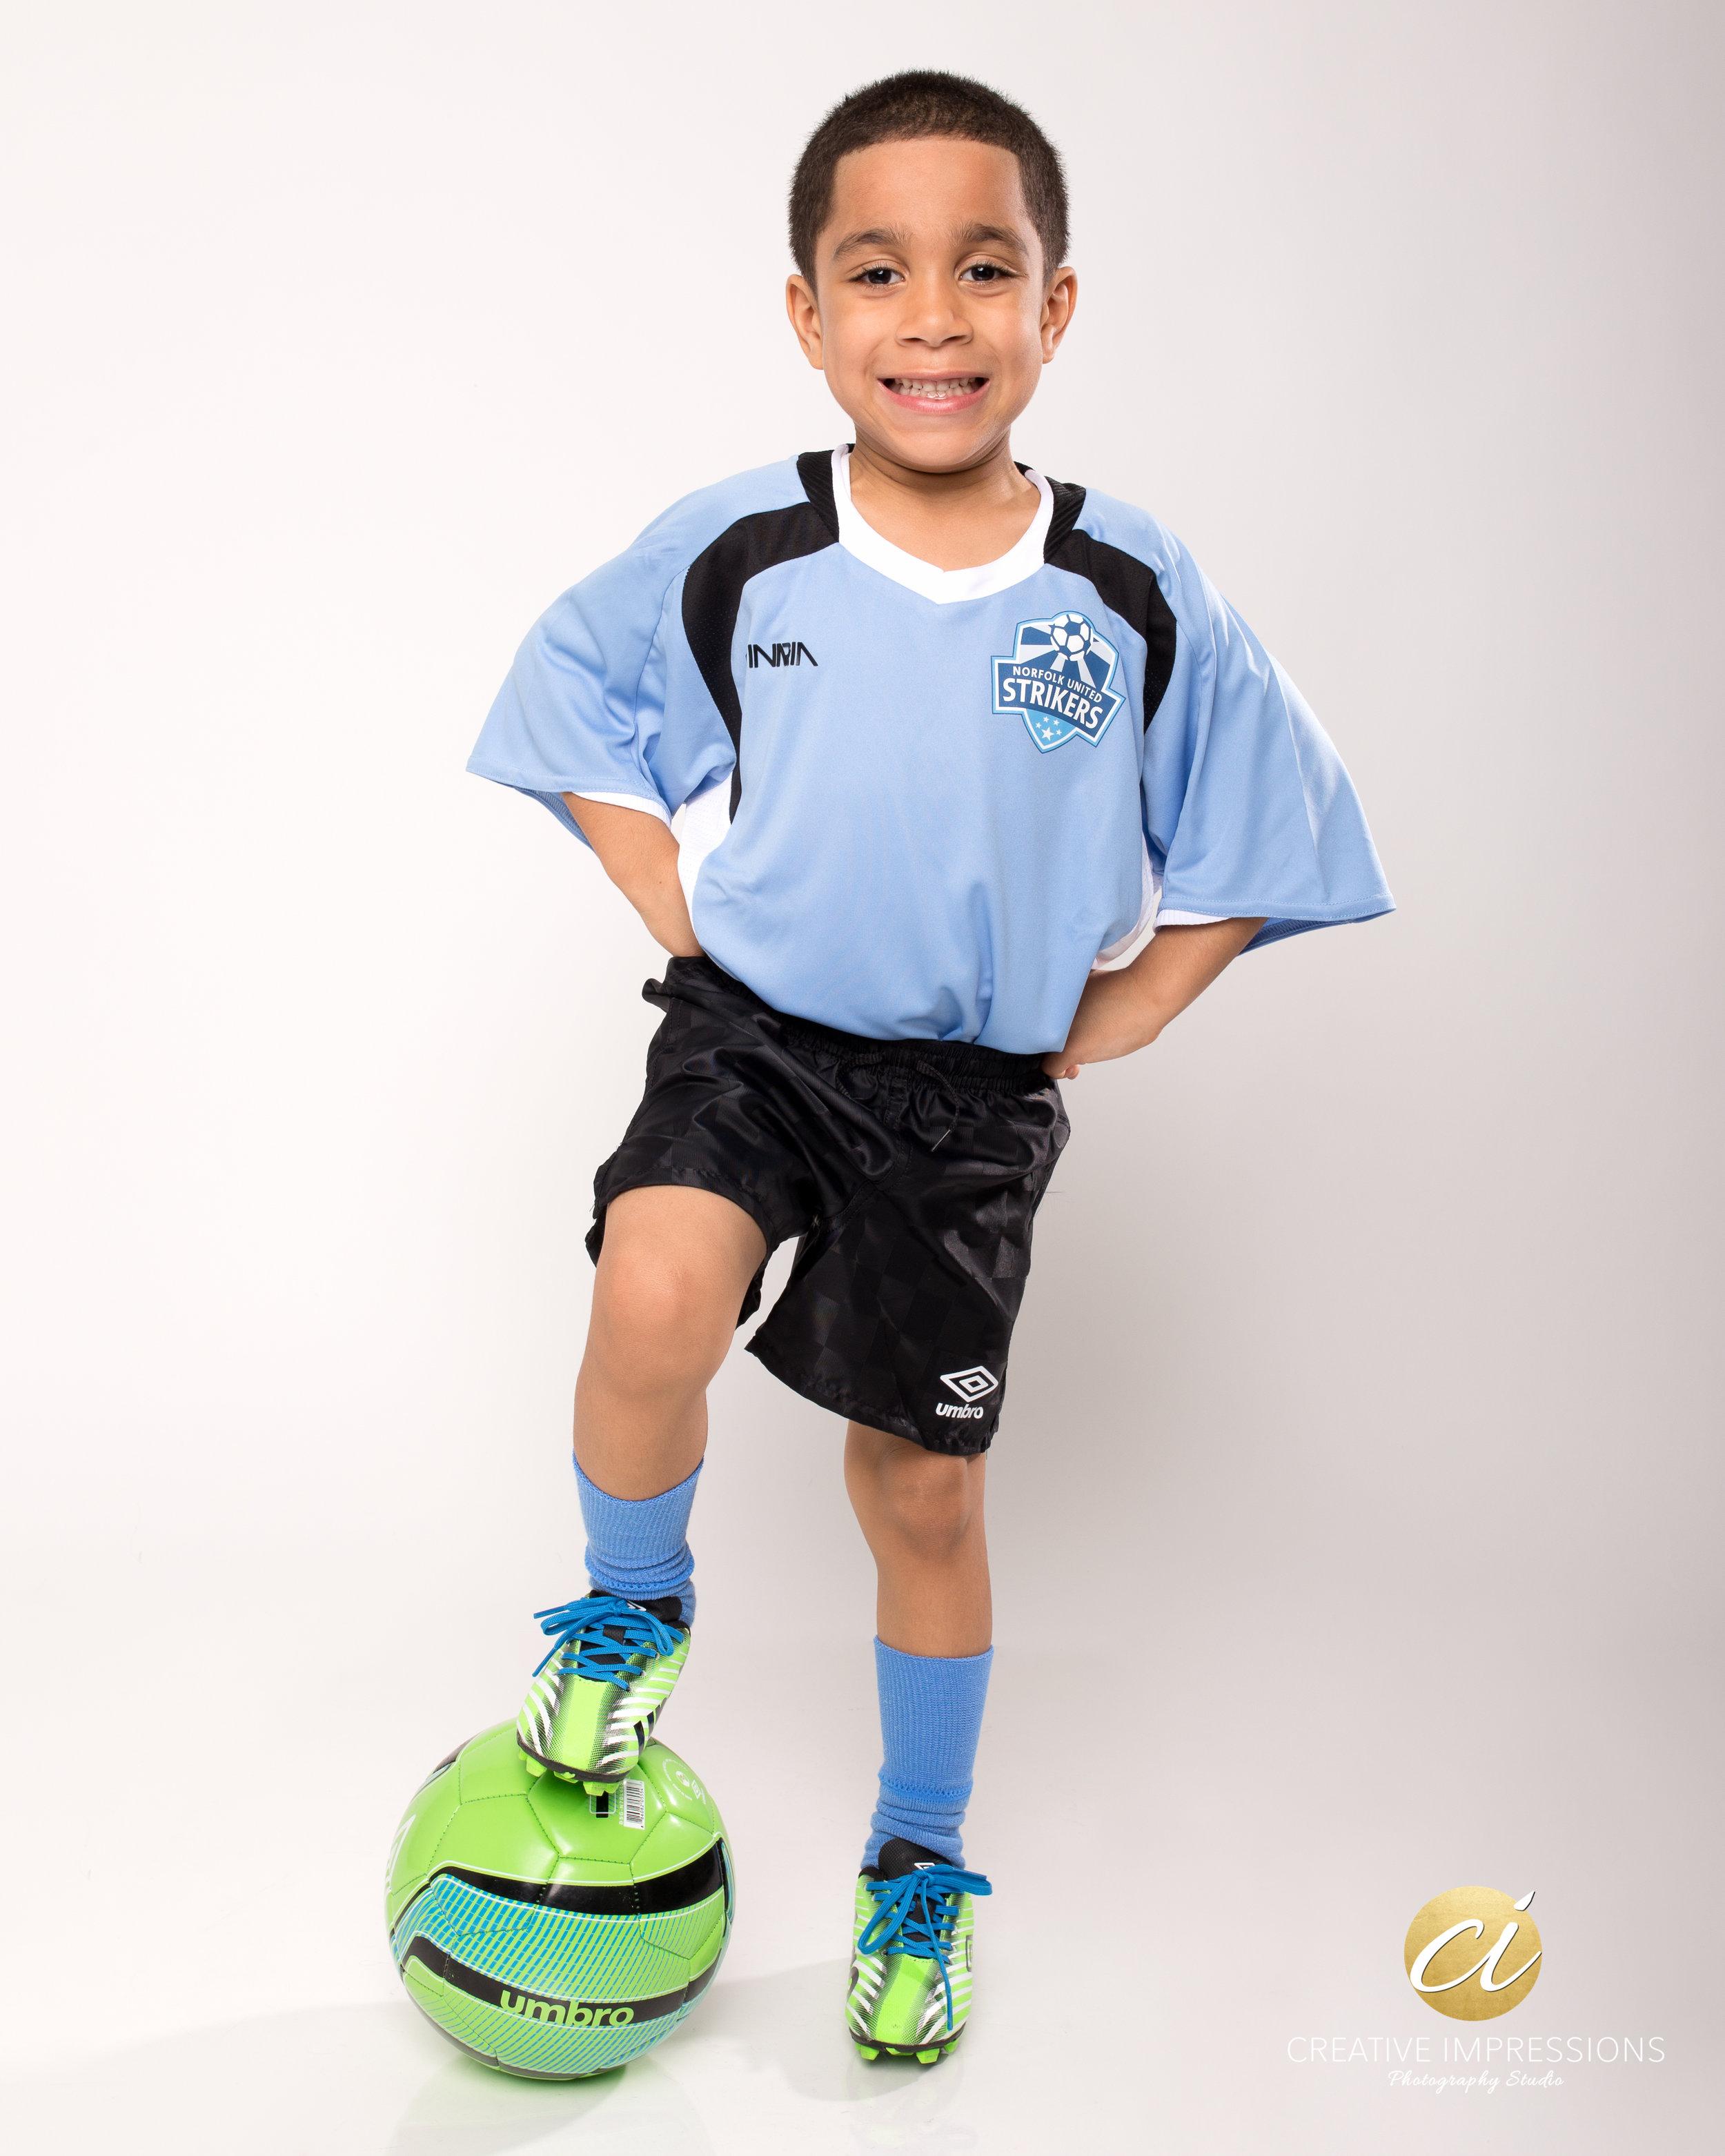 BJ Soccer - Creative Impressions -1.jpg